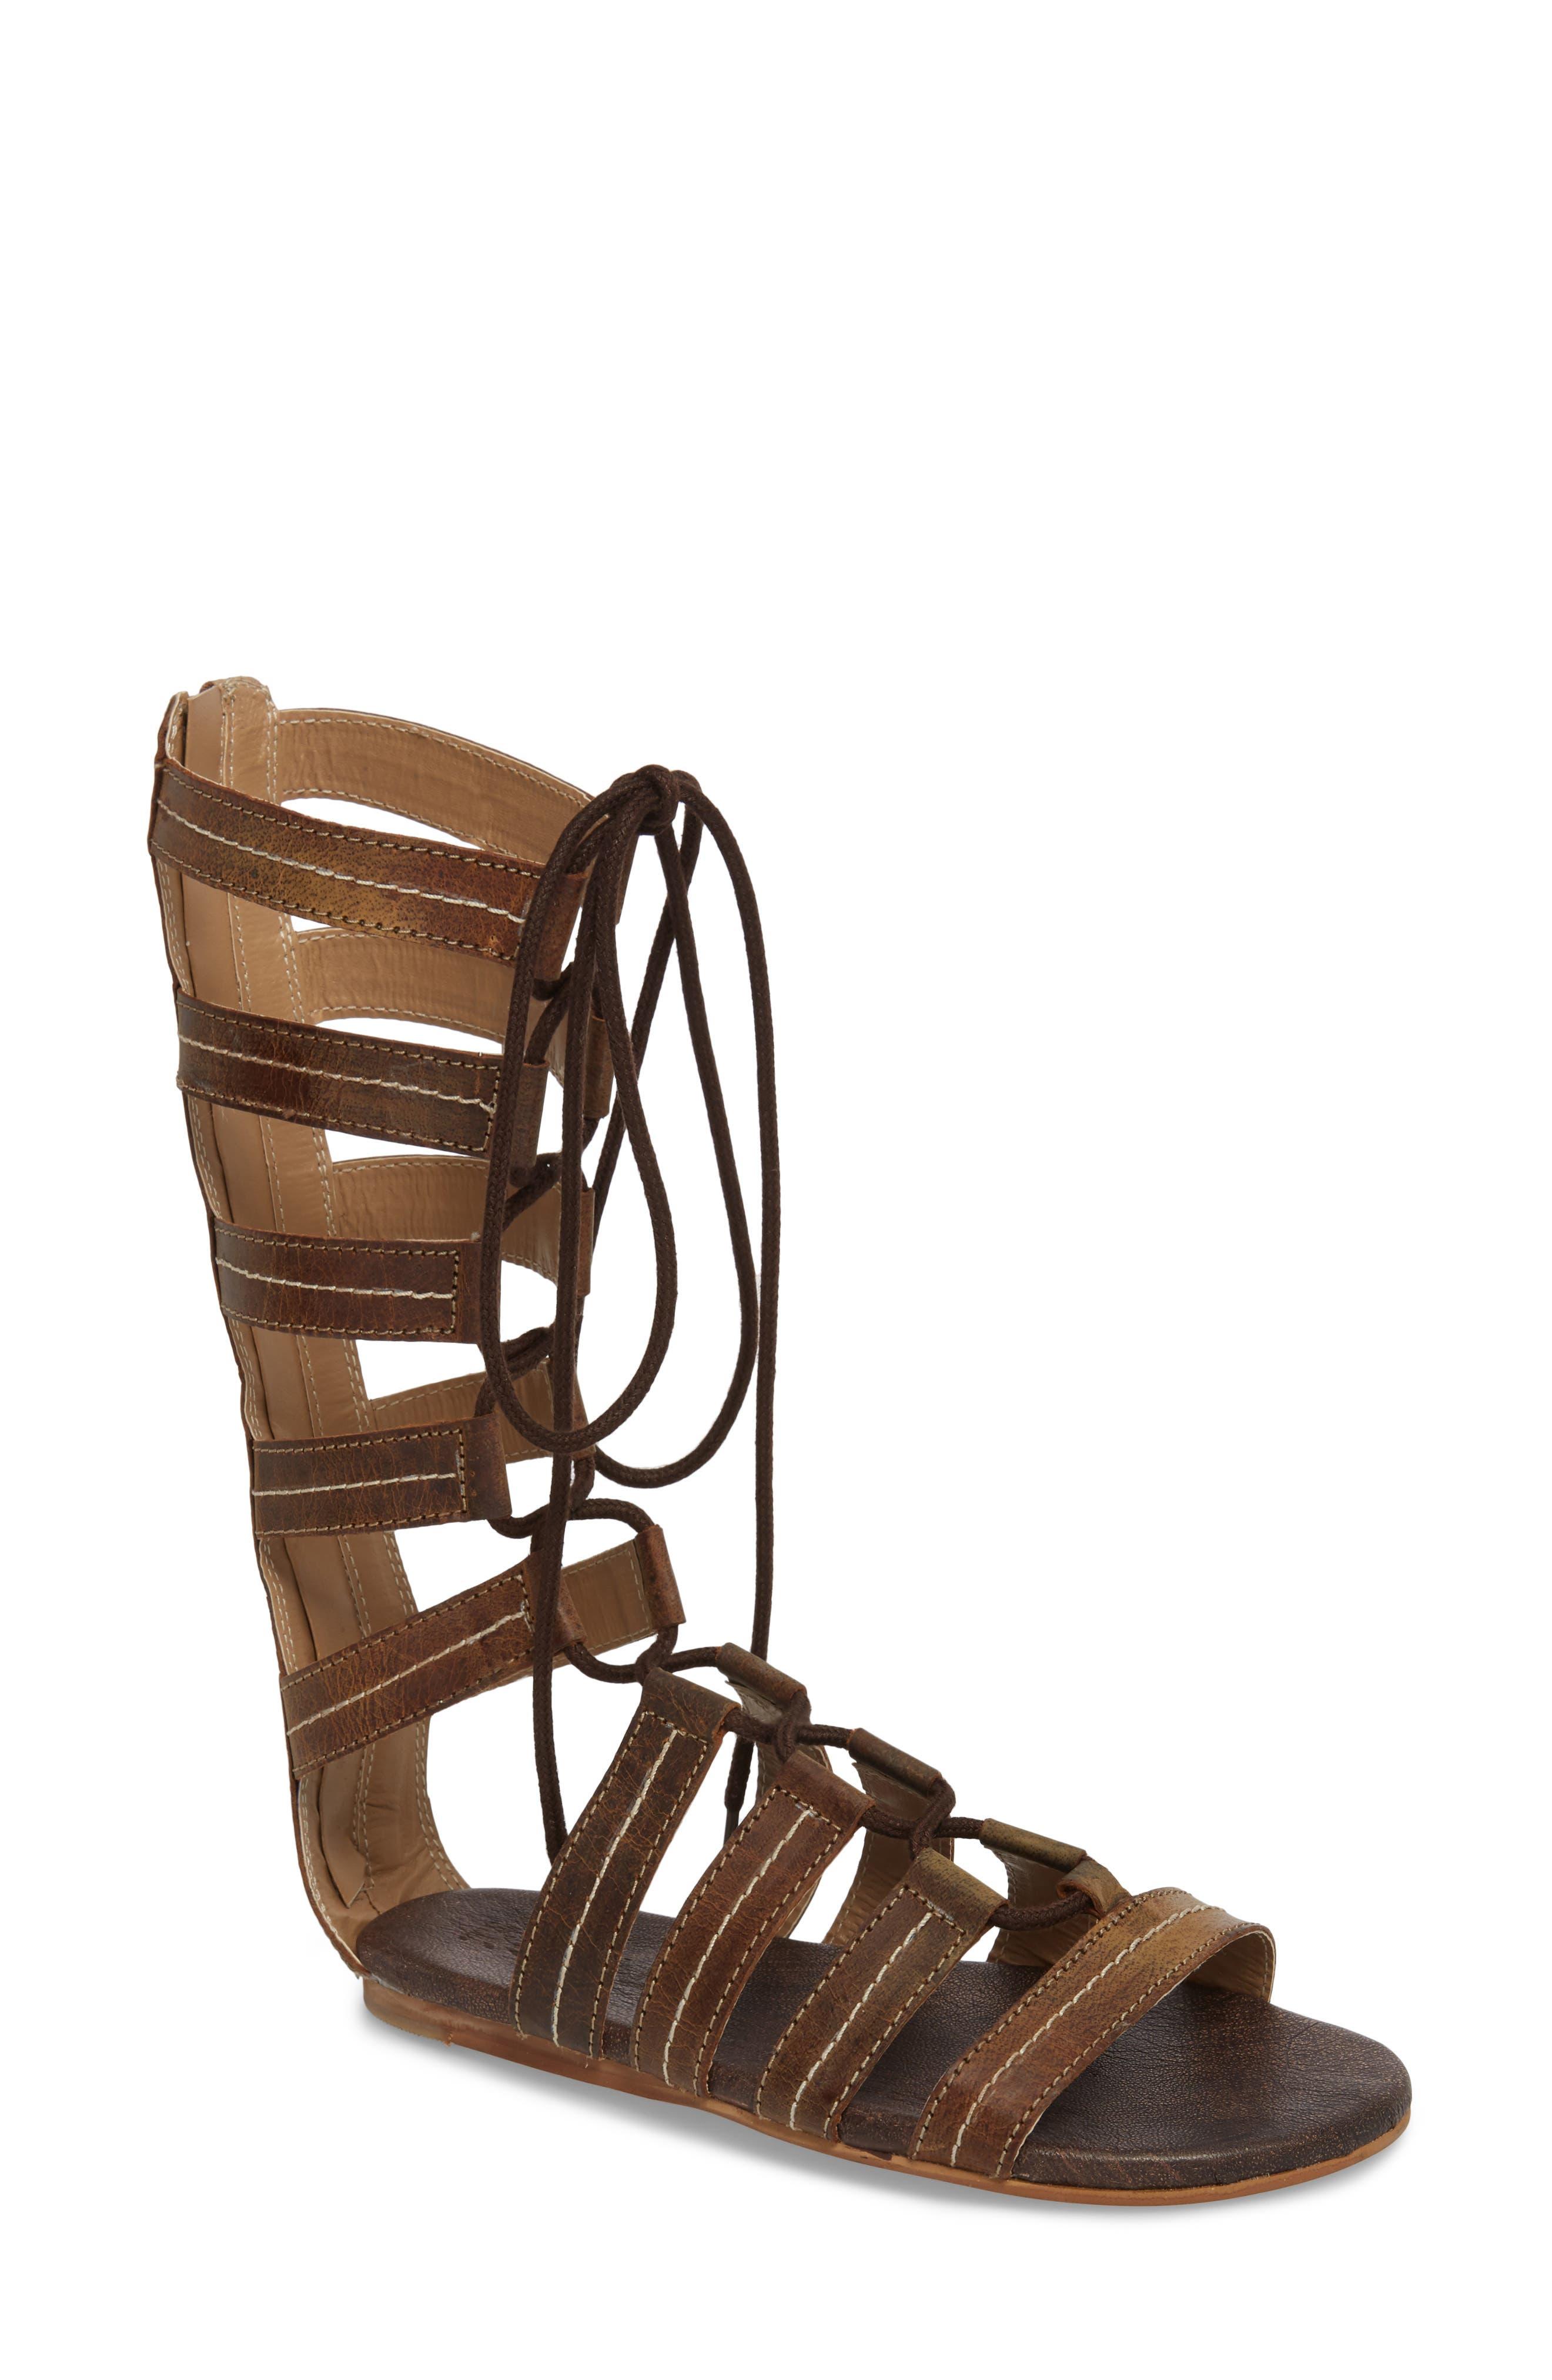 Rhea Lace-Up Gladiator Sandal,                         Main,                         color, TAN GREENLAND